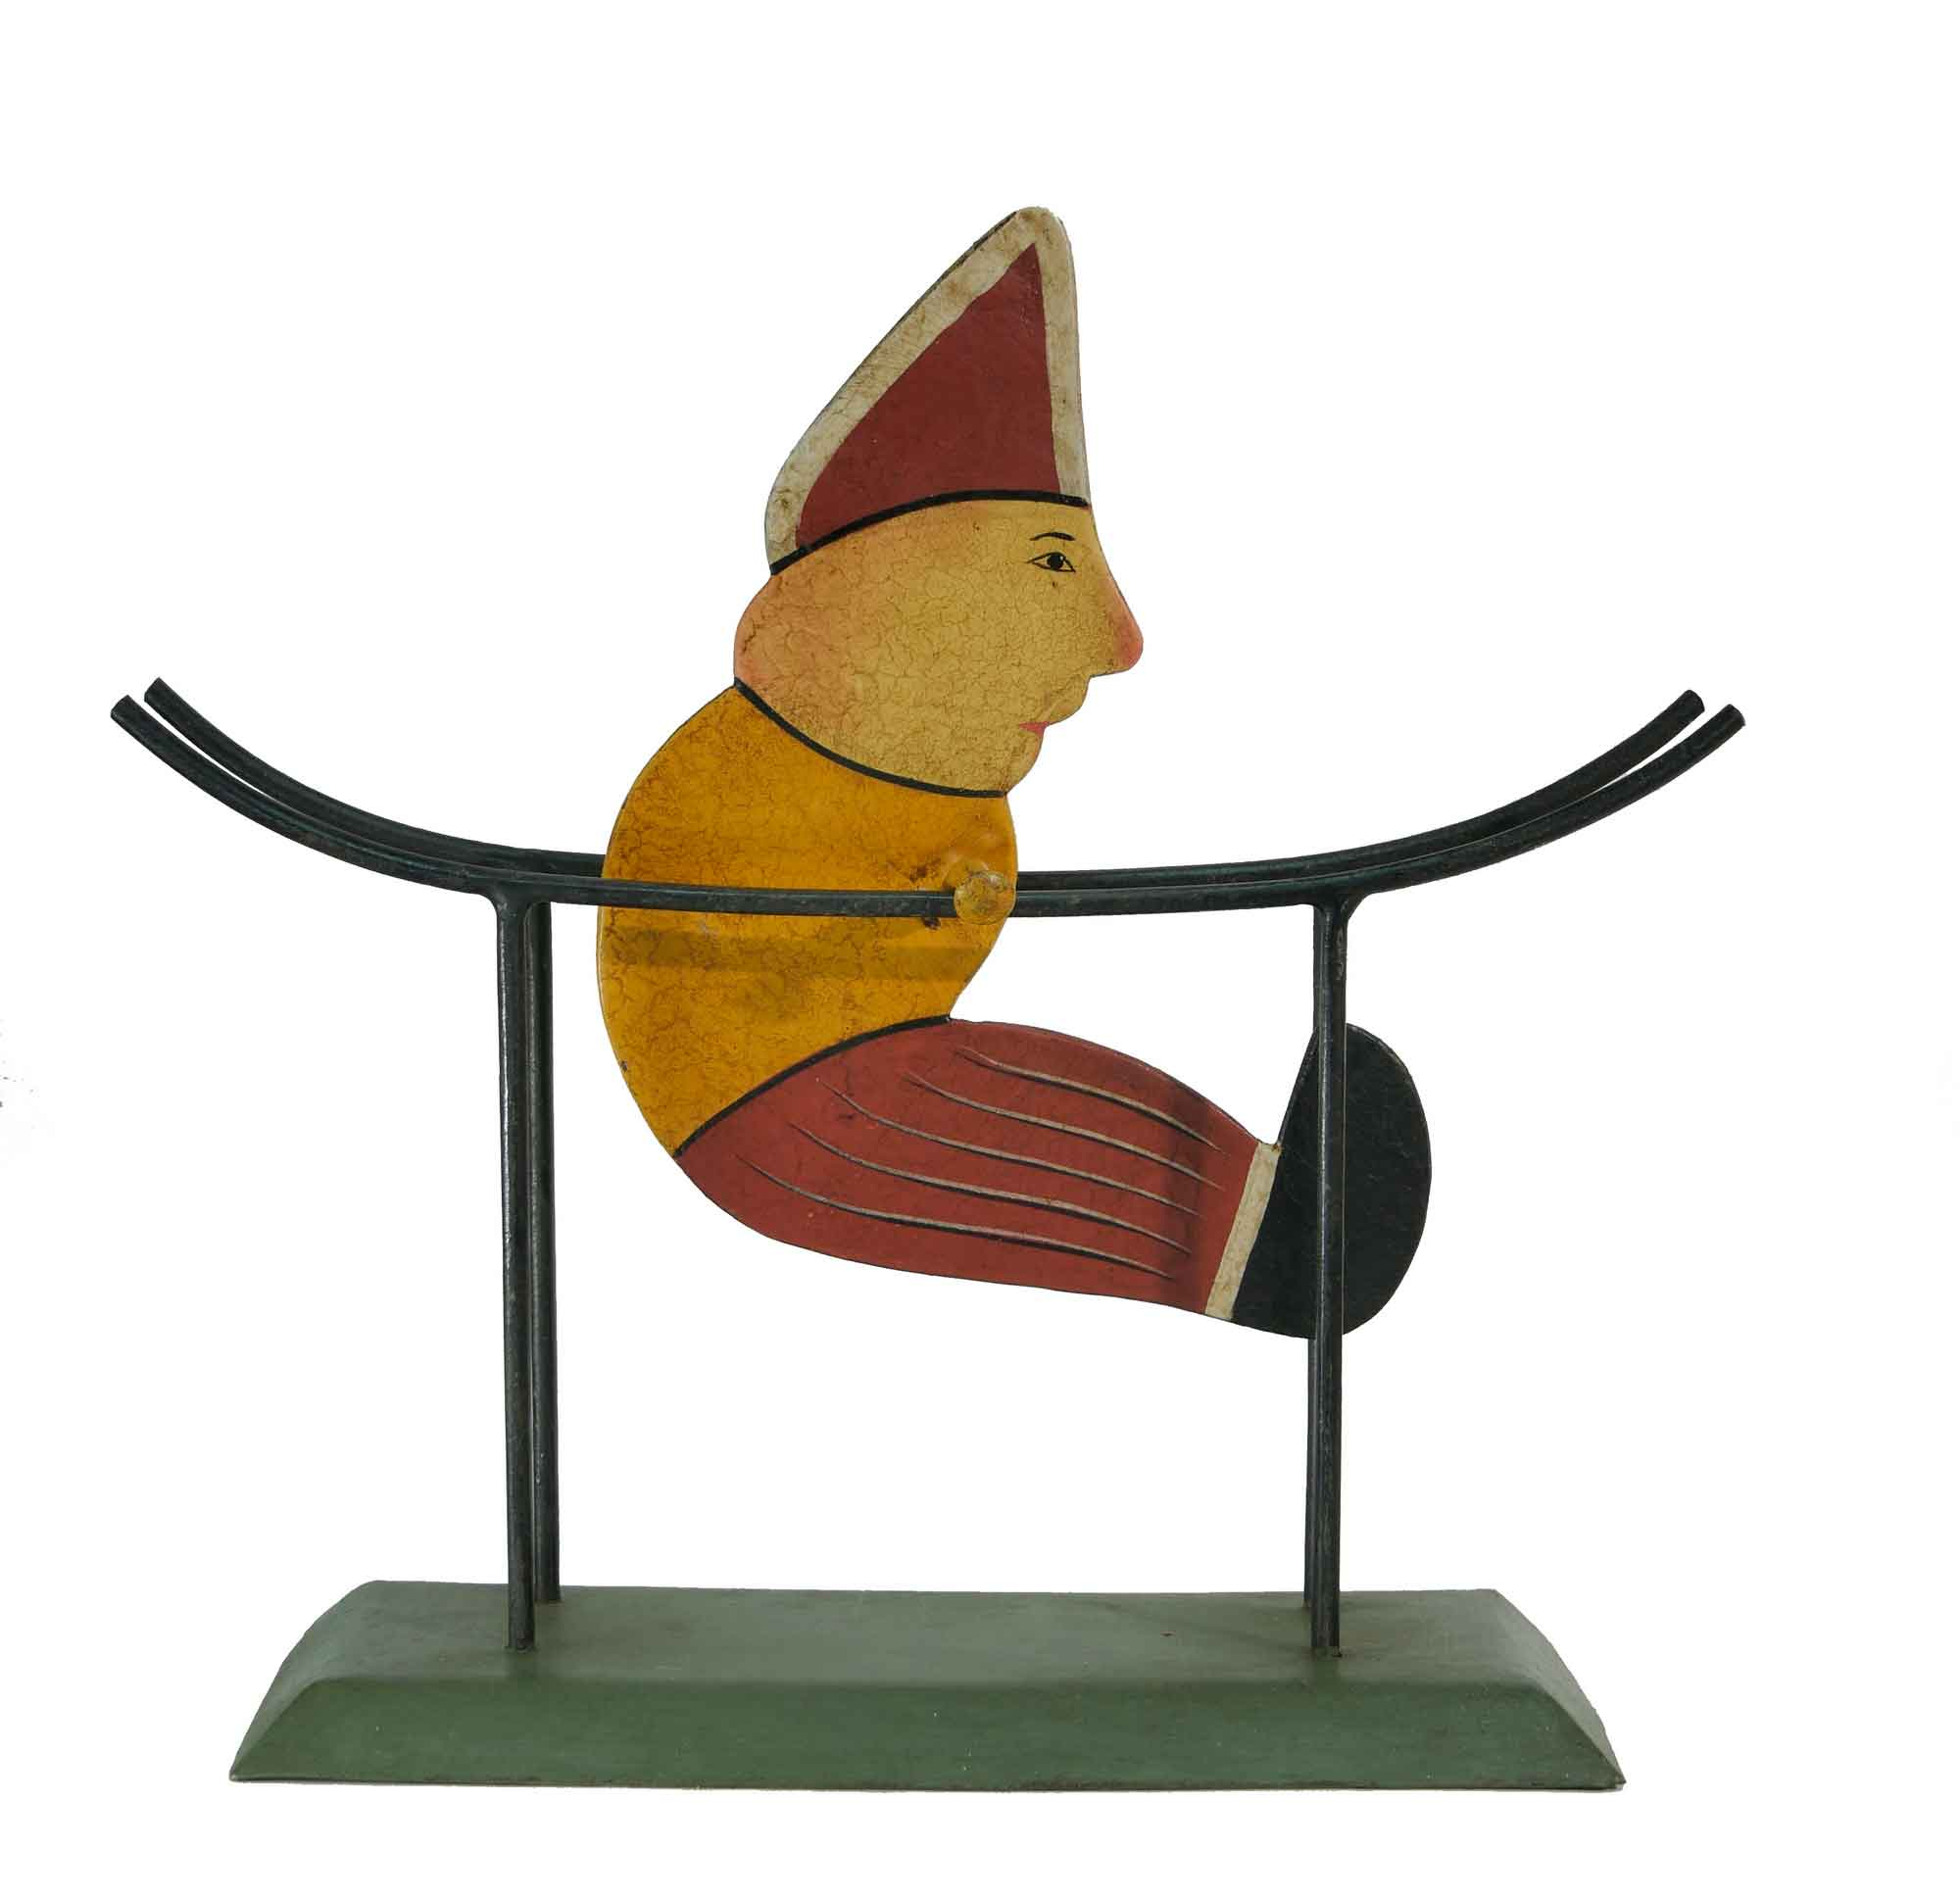 Balancefigur Akrobat